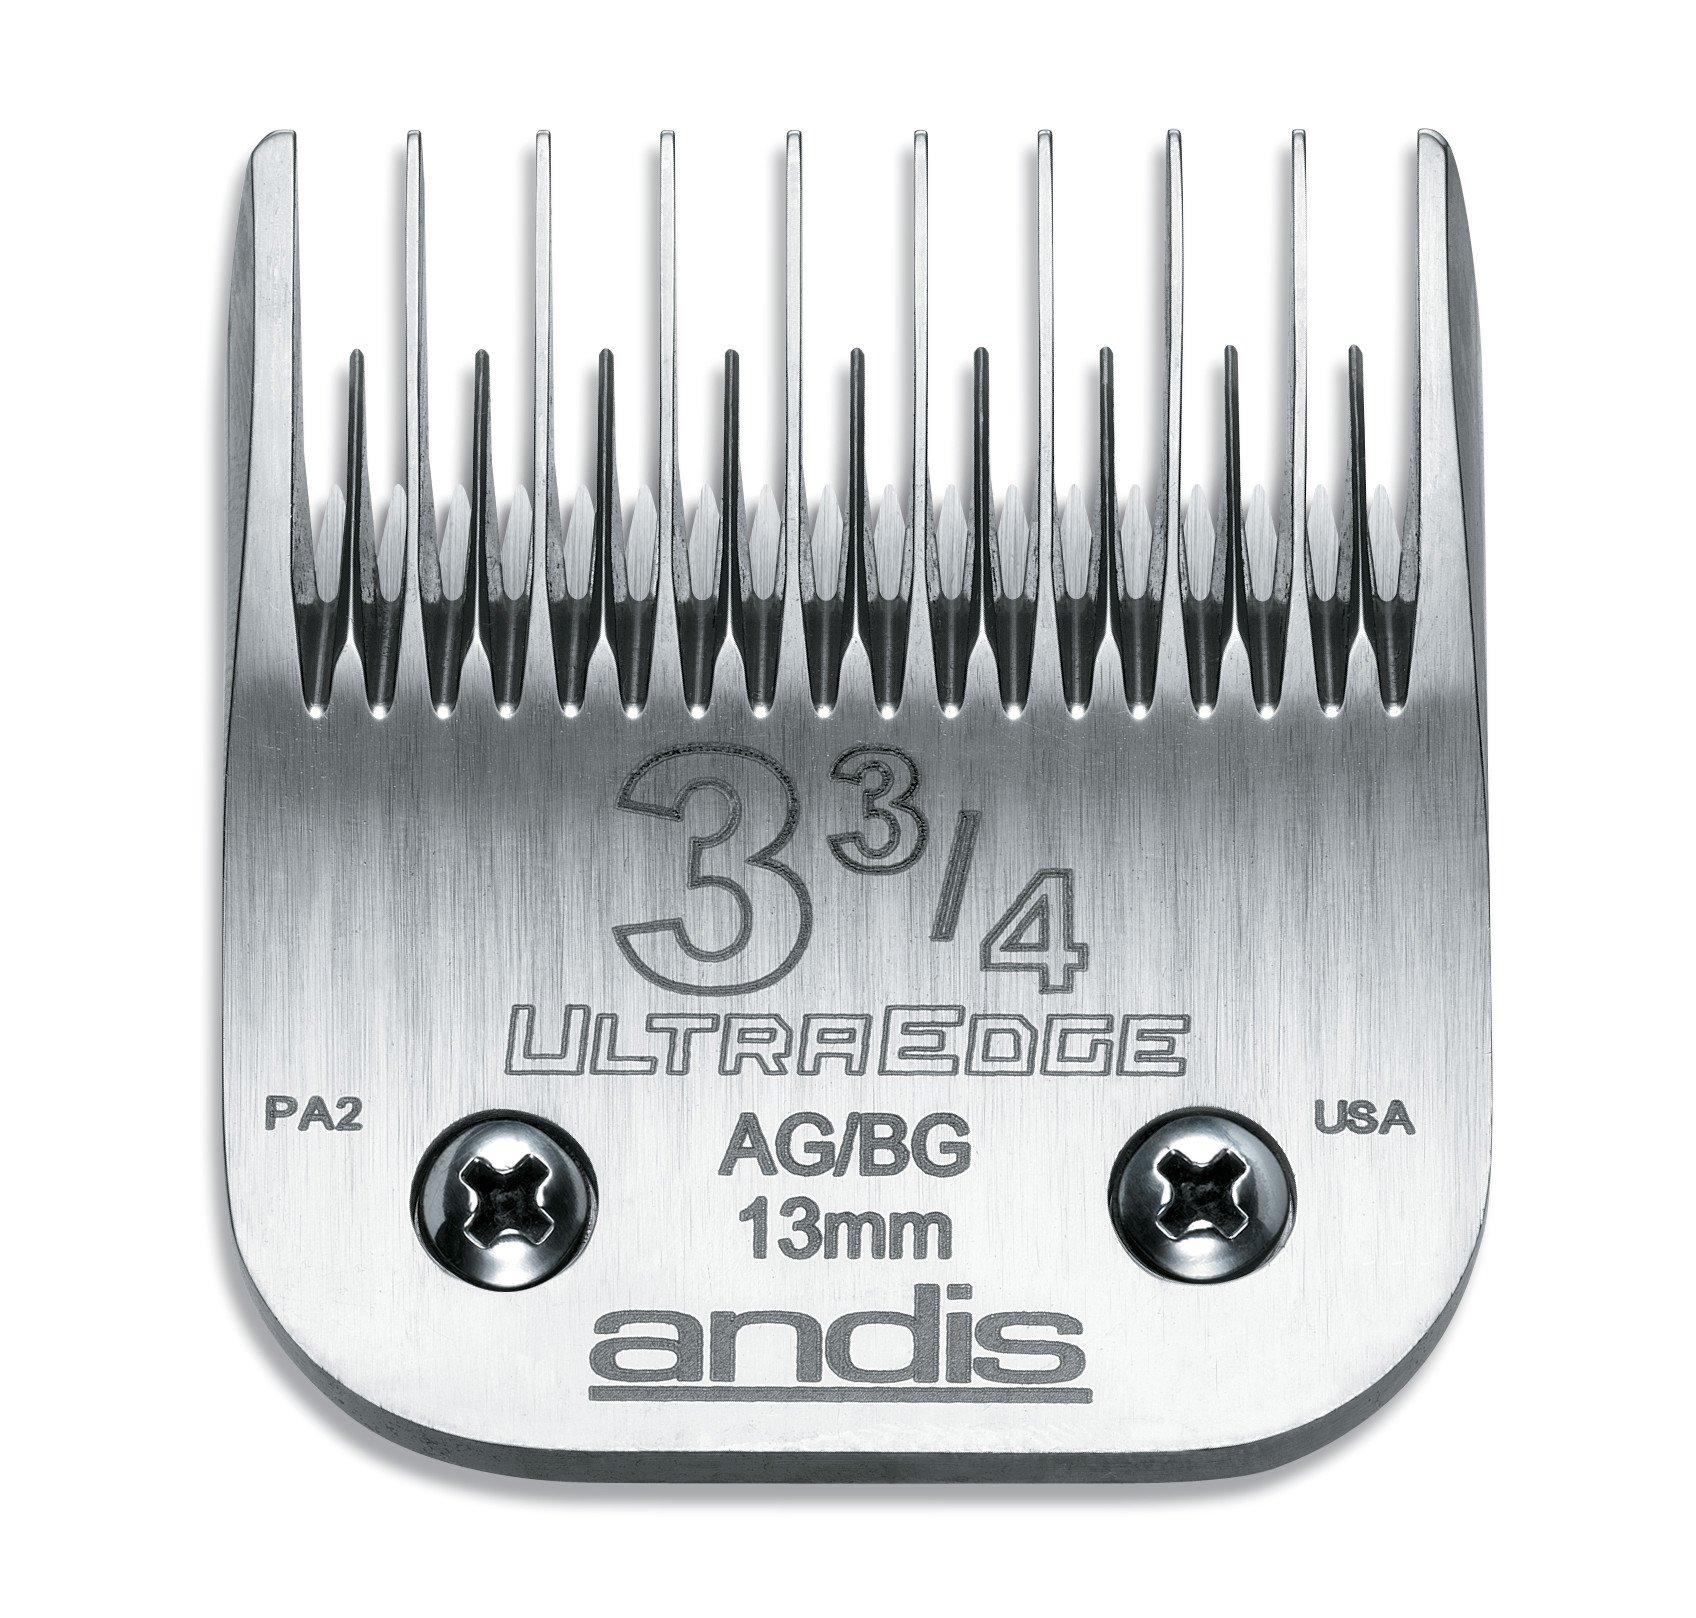 Cuchillas : Andis 3 3/4 Ultra Edge 64133 Reemplazo